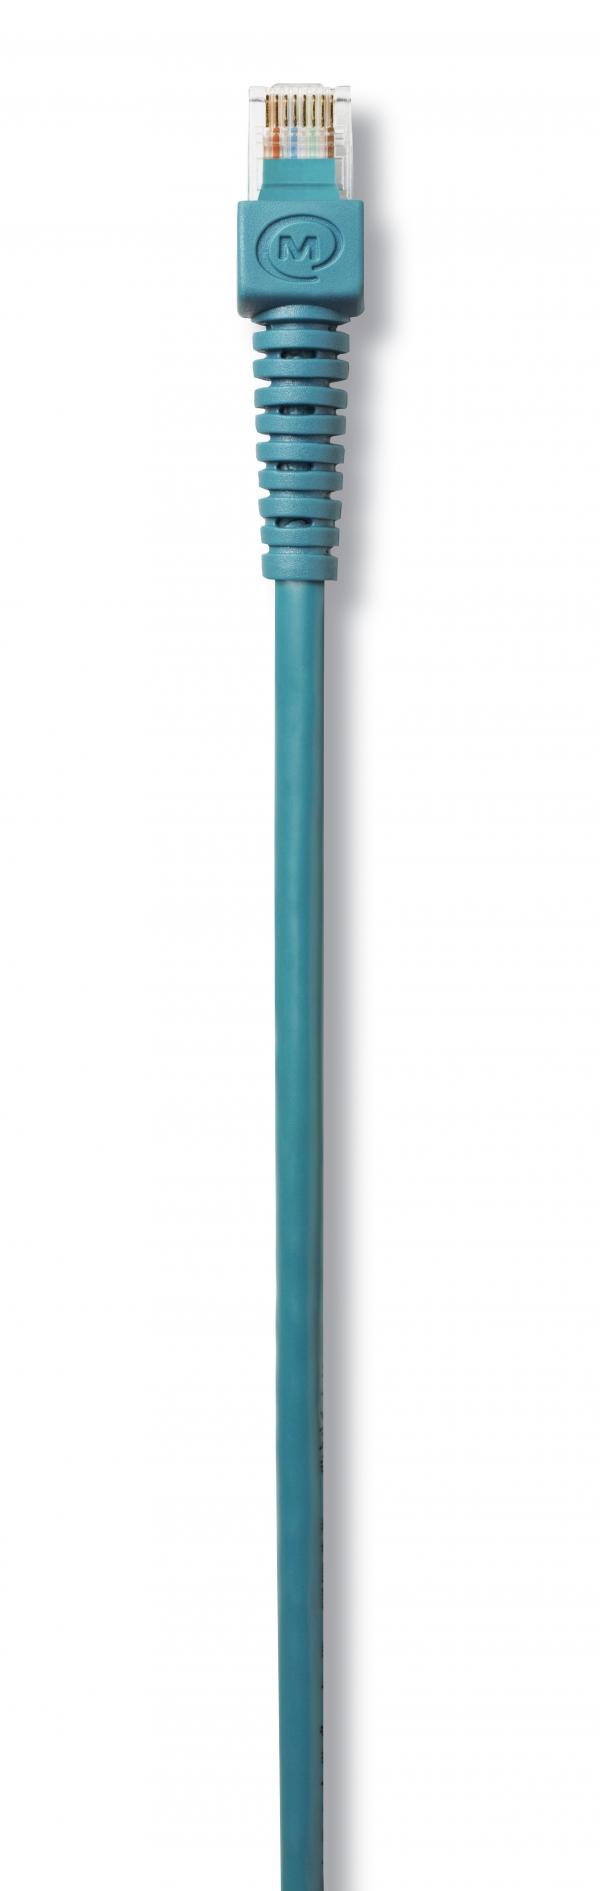 MasterBus cable, 100 metre